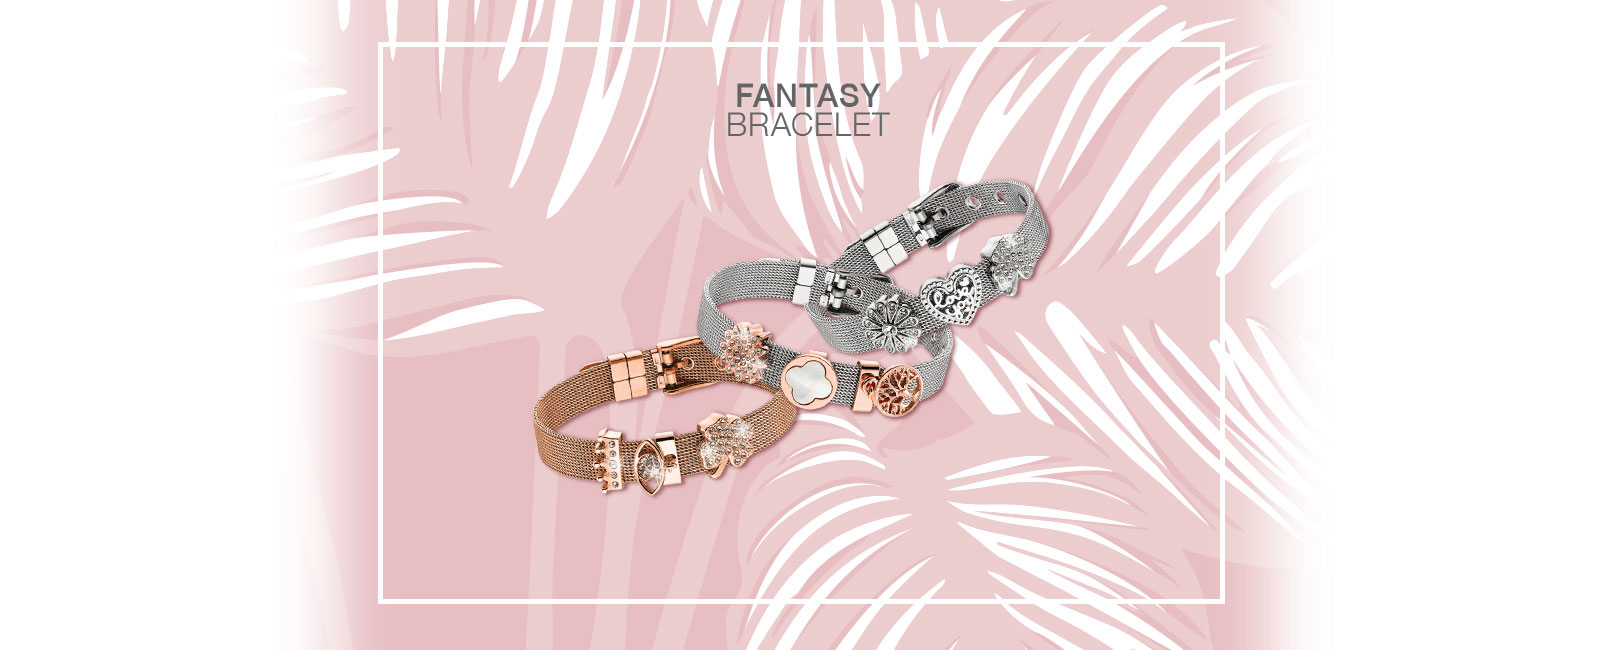 Fantasy Bracelet - Loisir